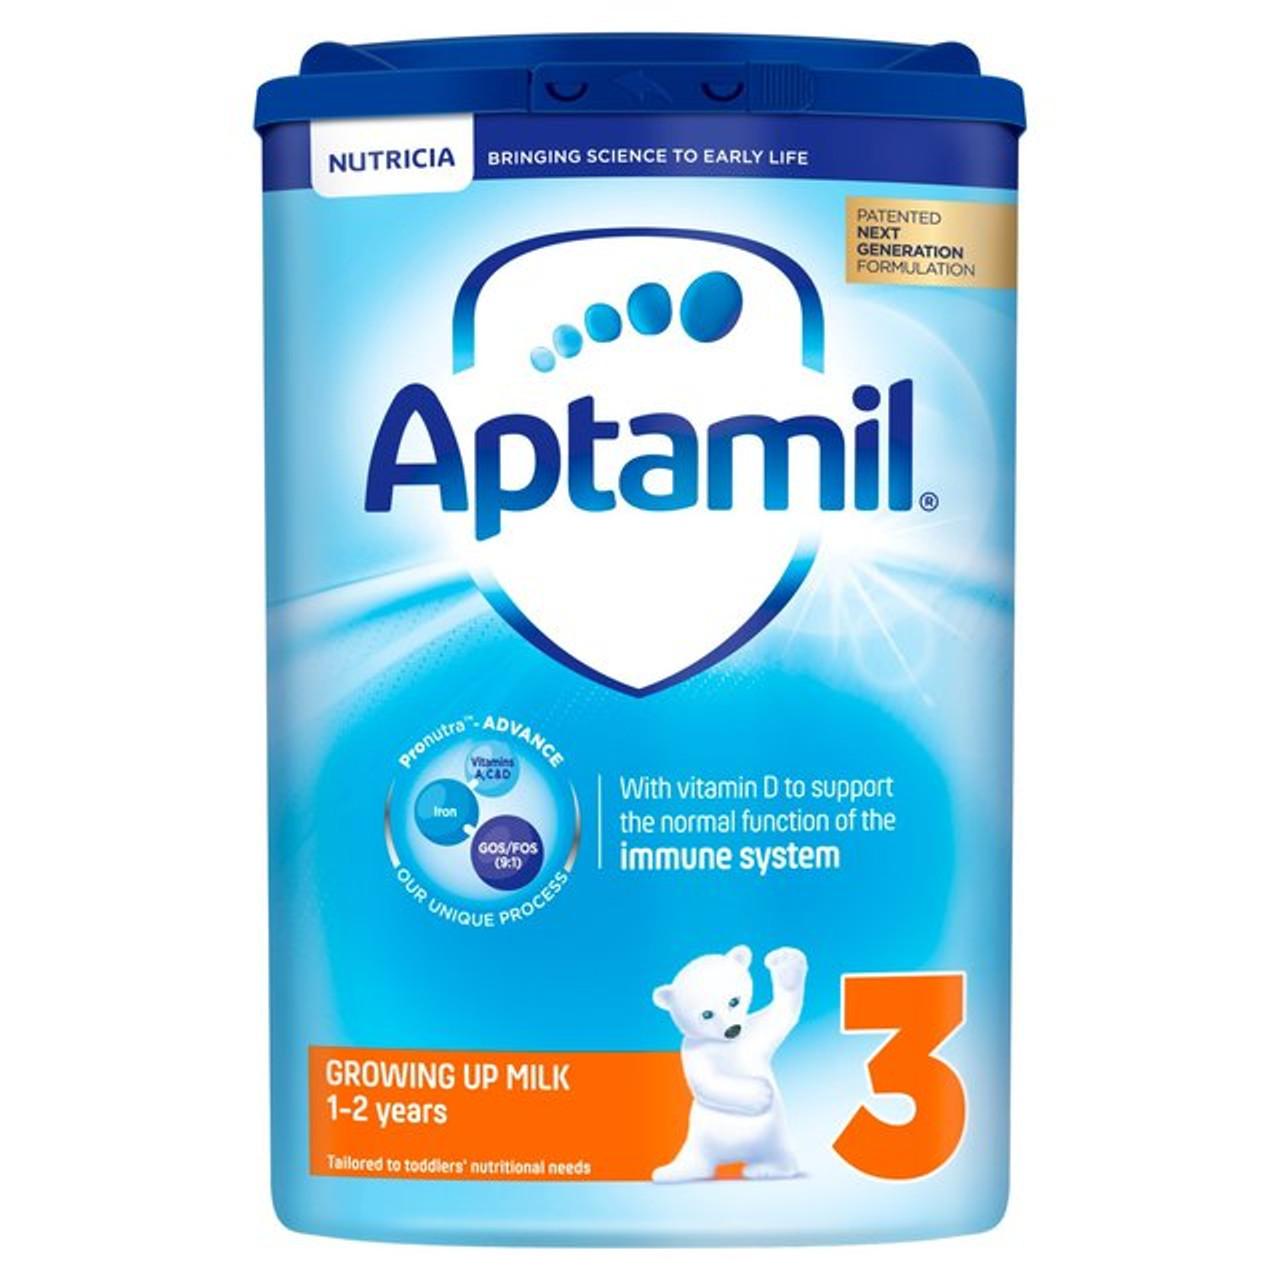 Aptamil 3 Growing Up 1 to 2 yrs Milk Baby Formula 800g